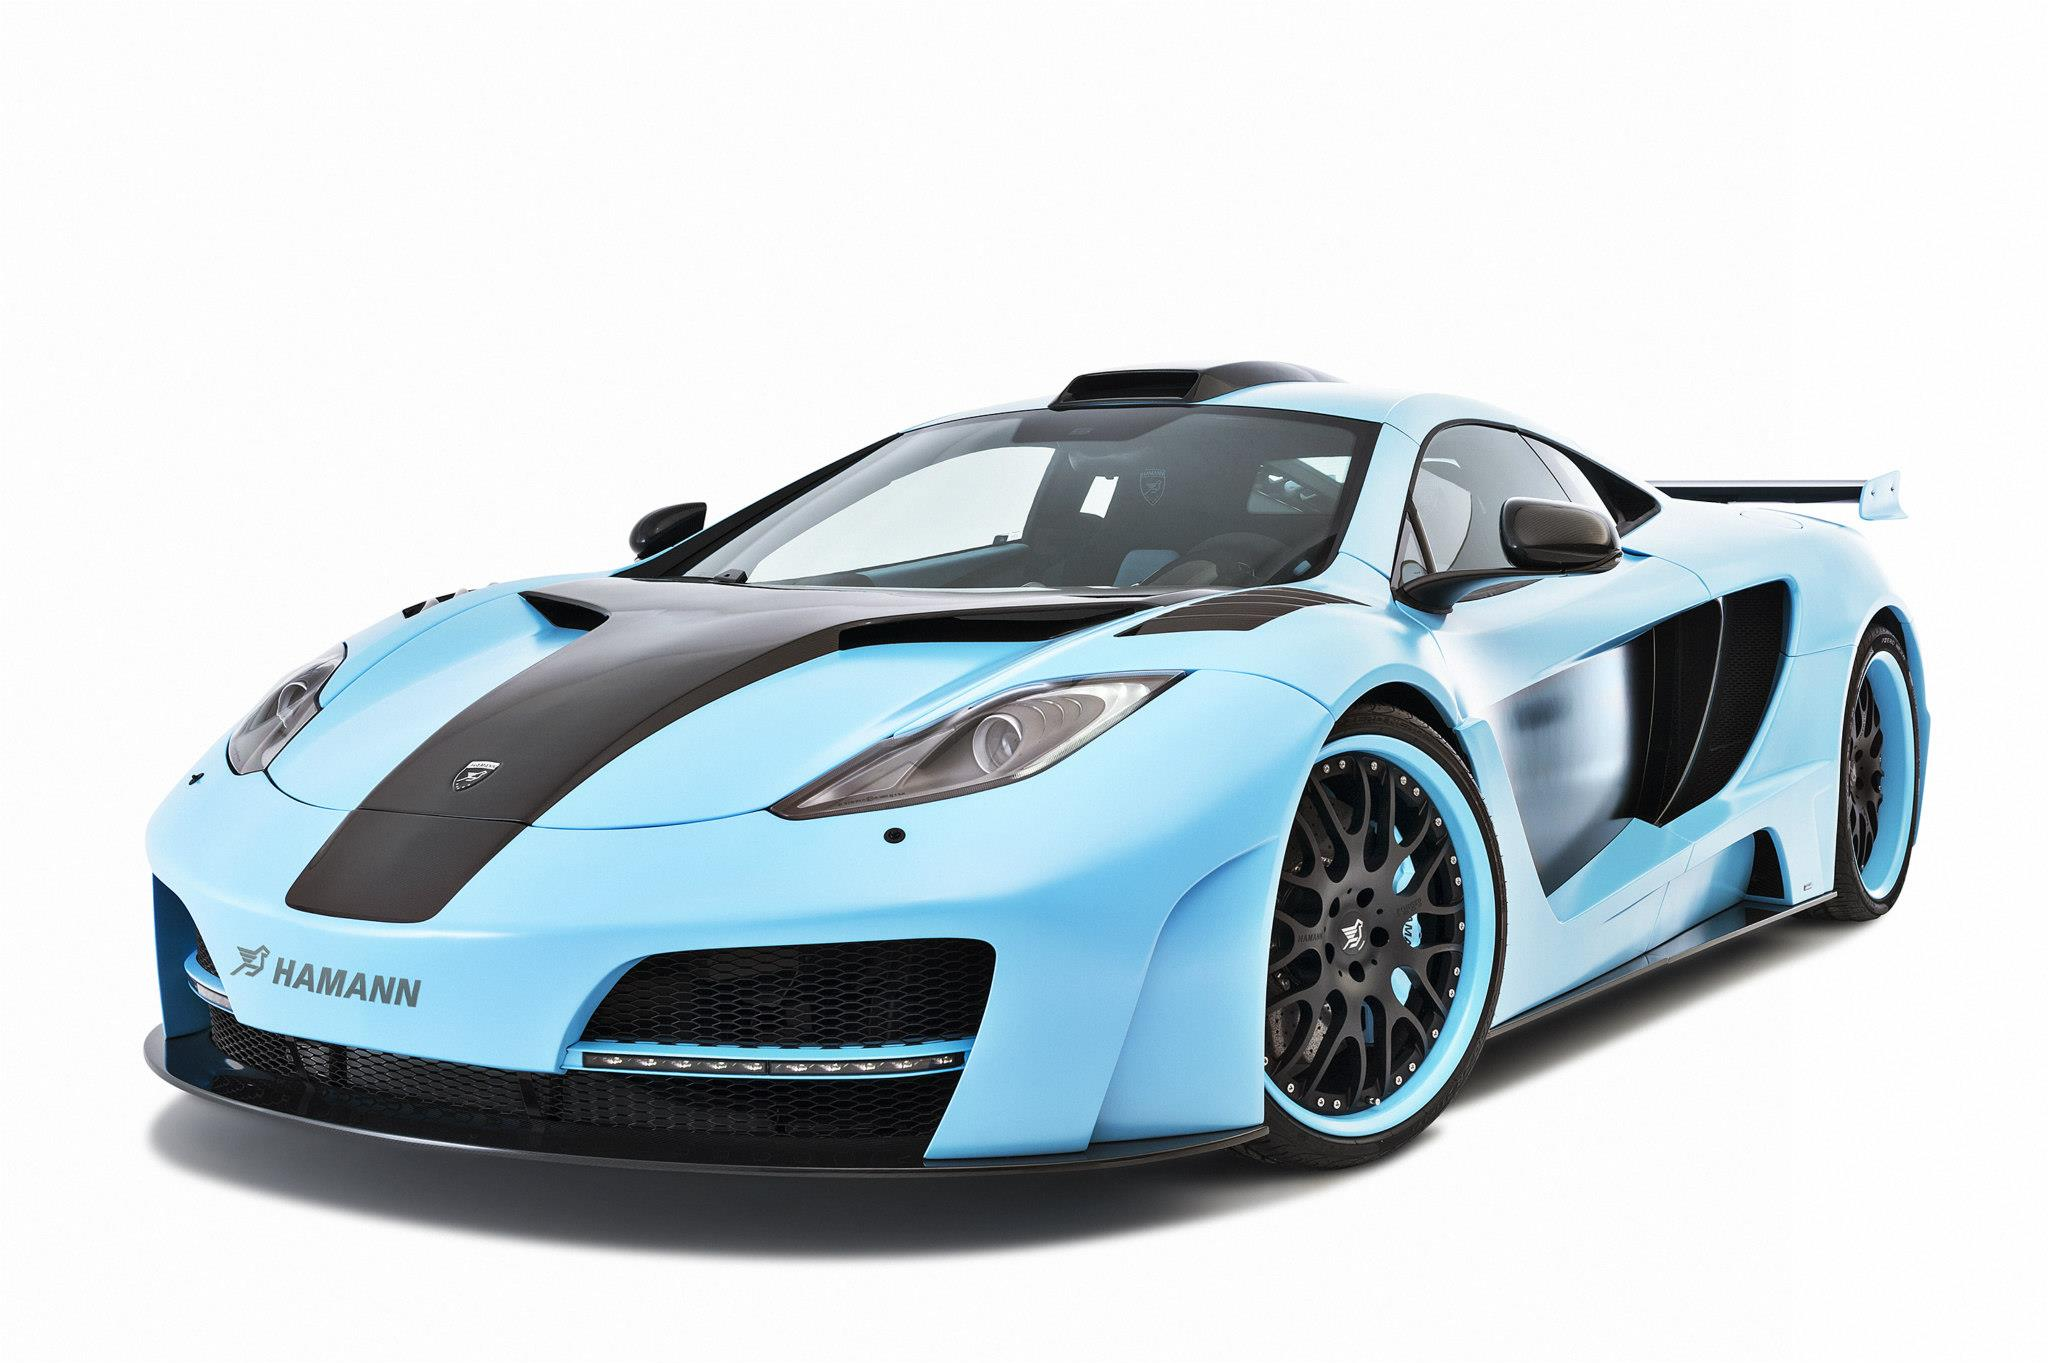 2013 hamann blue memor mclaren mp4 12c tuning supercar - 2048 supercars ...